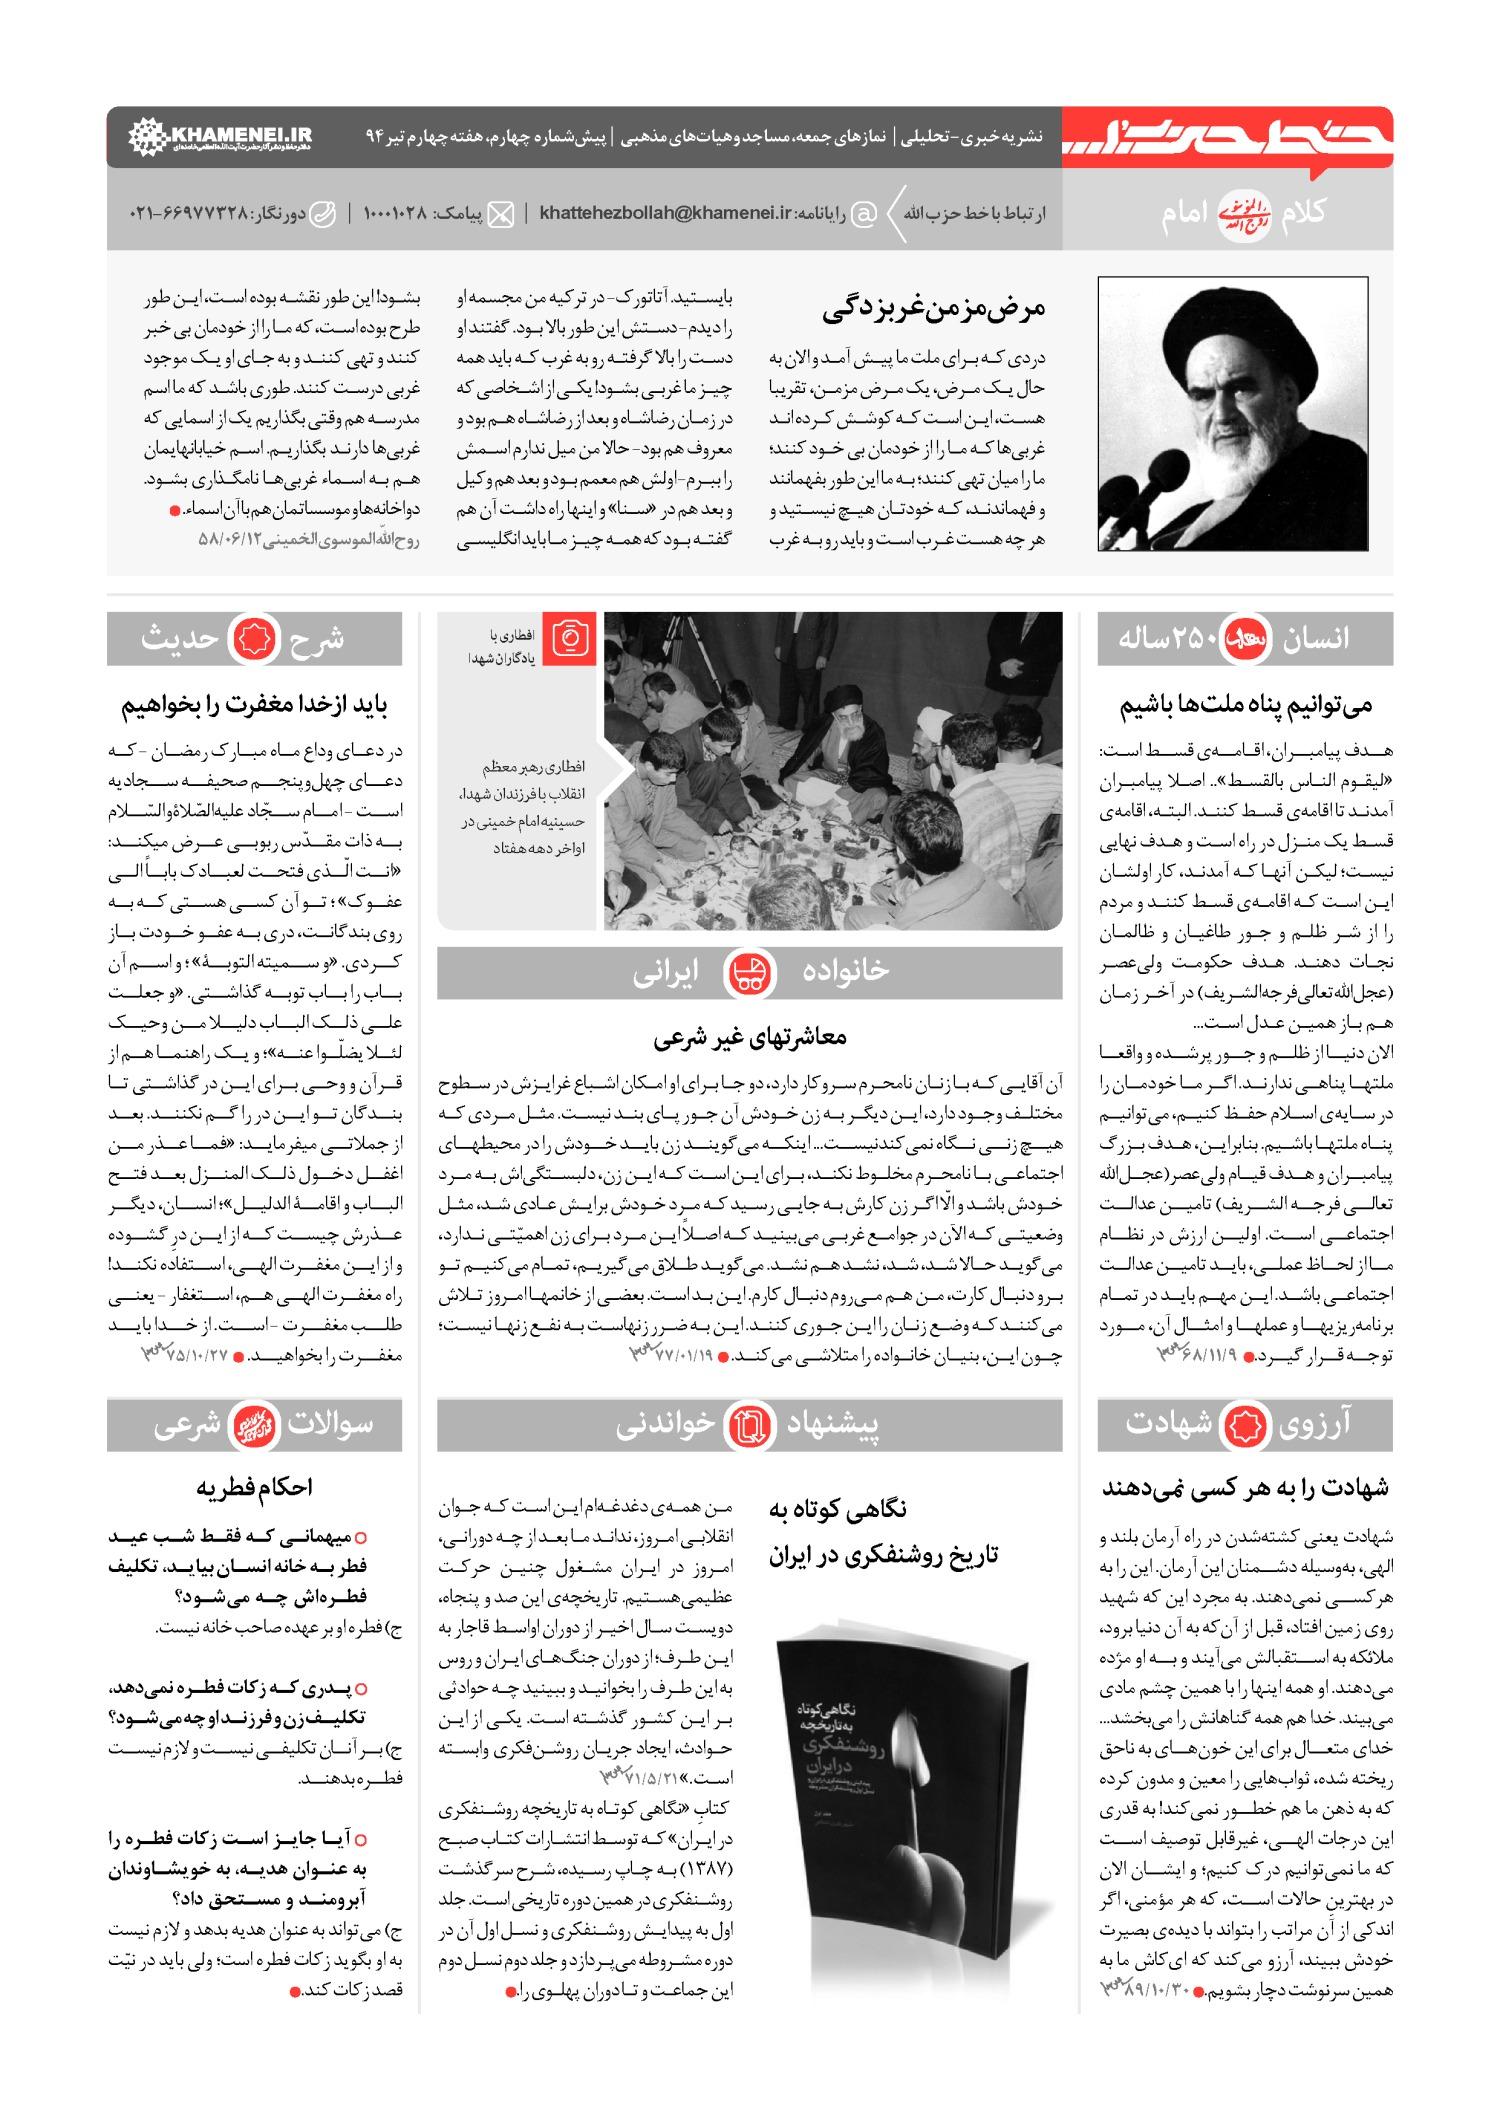 خط حزب الله -پیش شماره چهارم page large 41